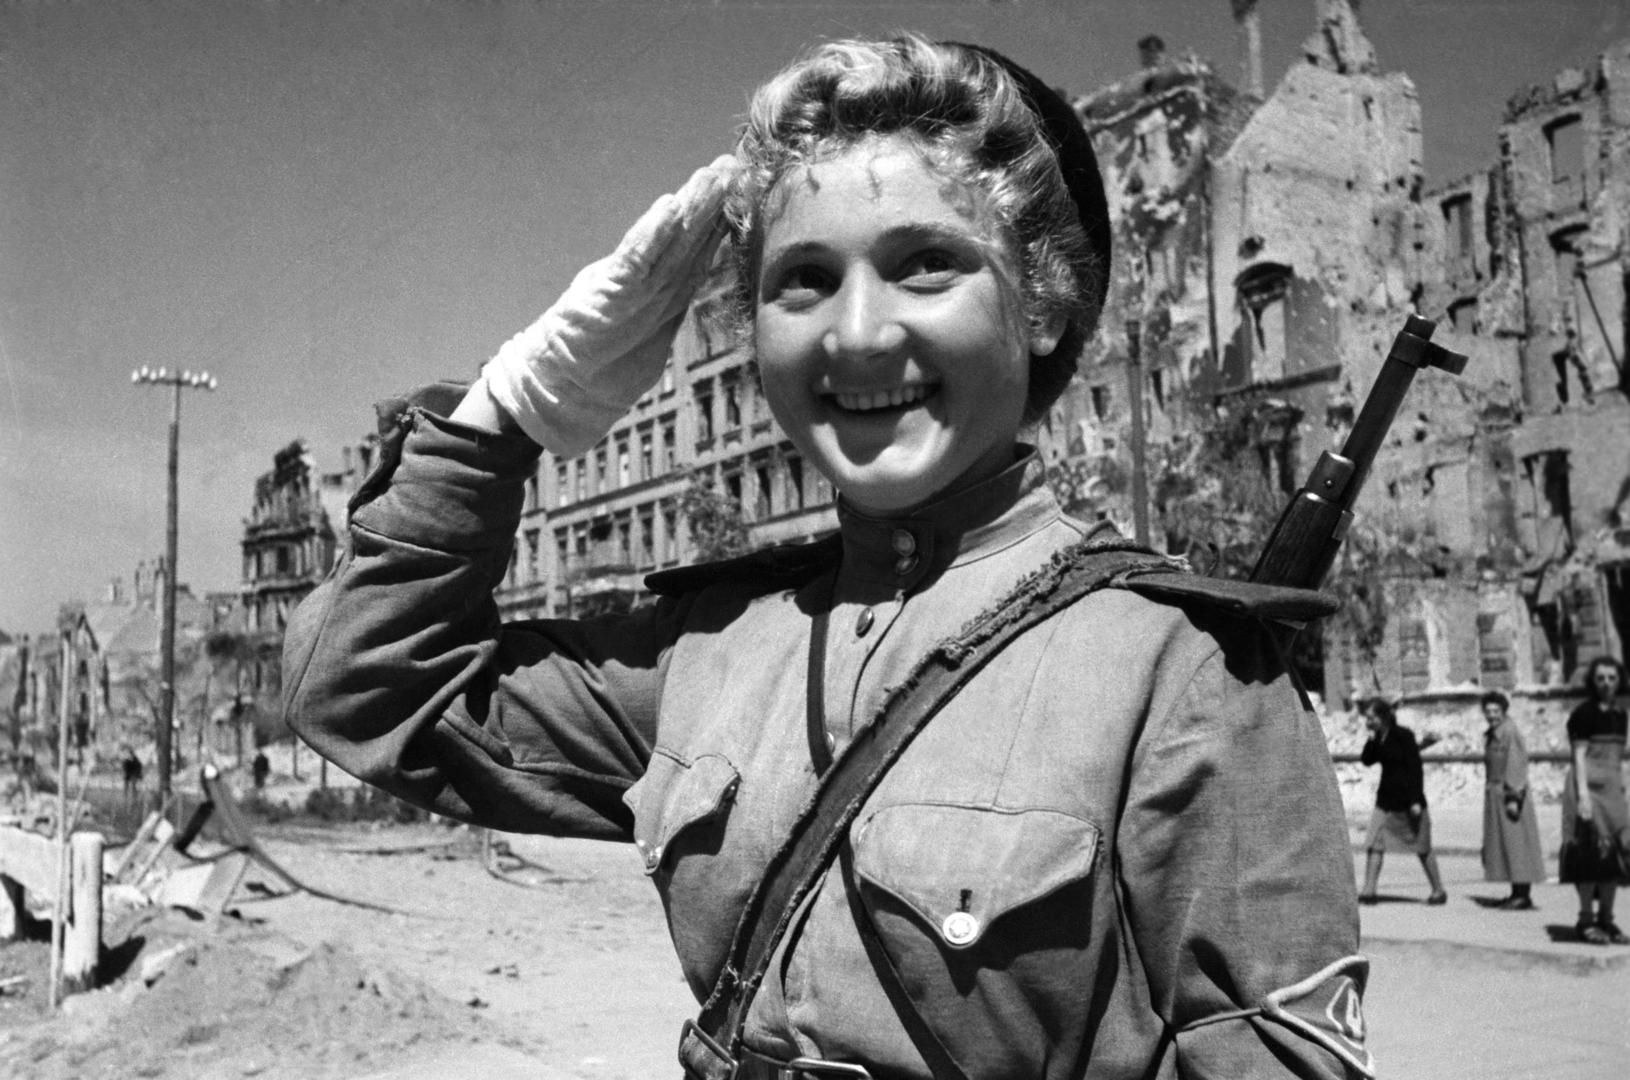 Sowjetische Soldatin am 1. Mai 1945 in Berlin